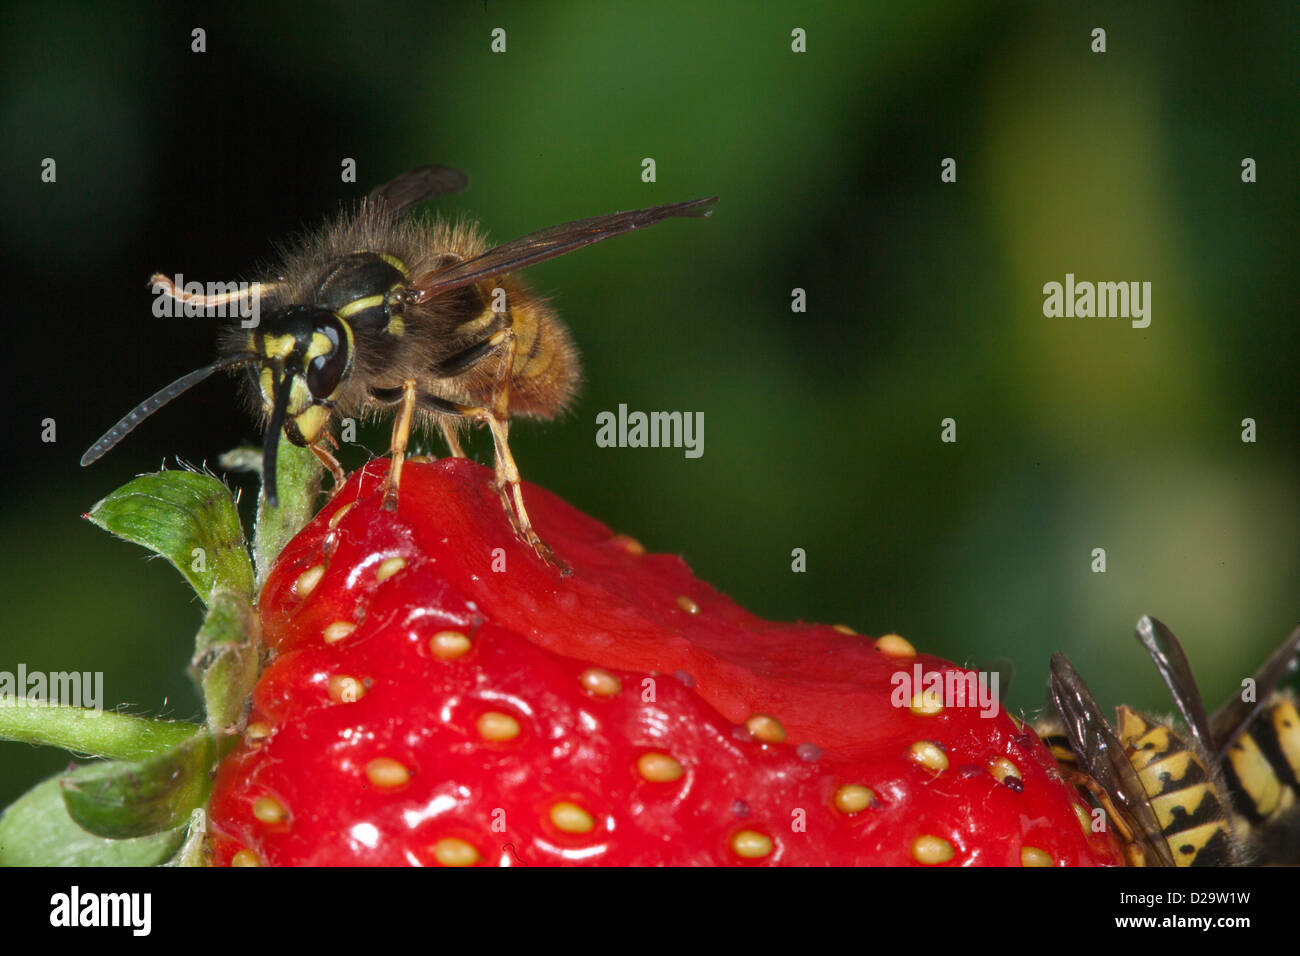 Common wasp  Vespula vulgaris - Stock Image